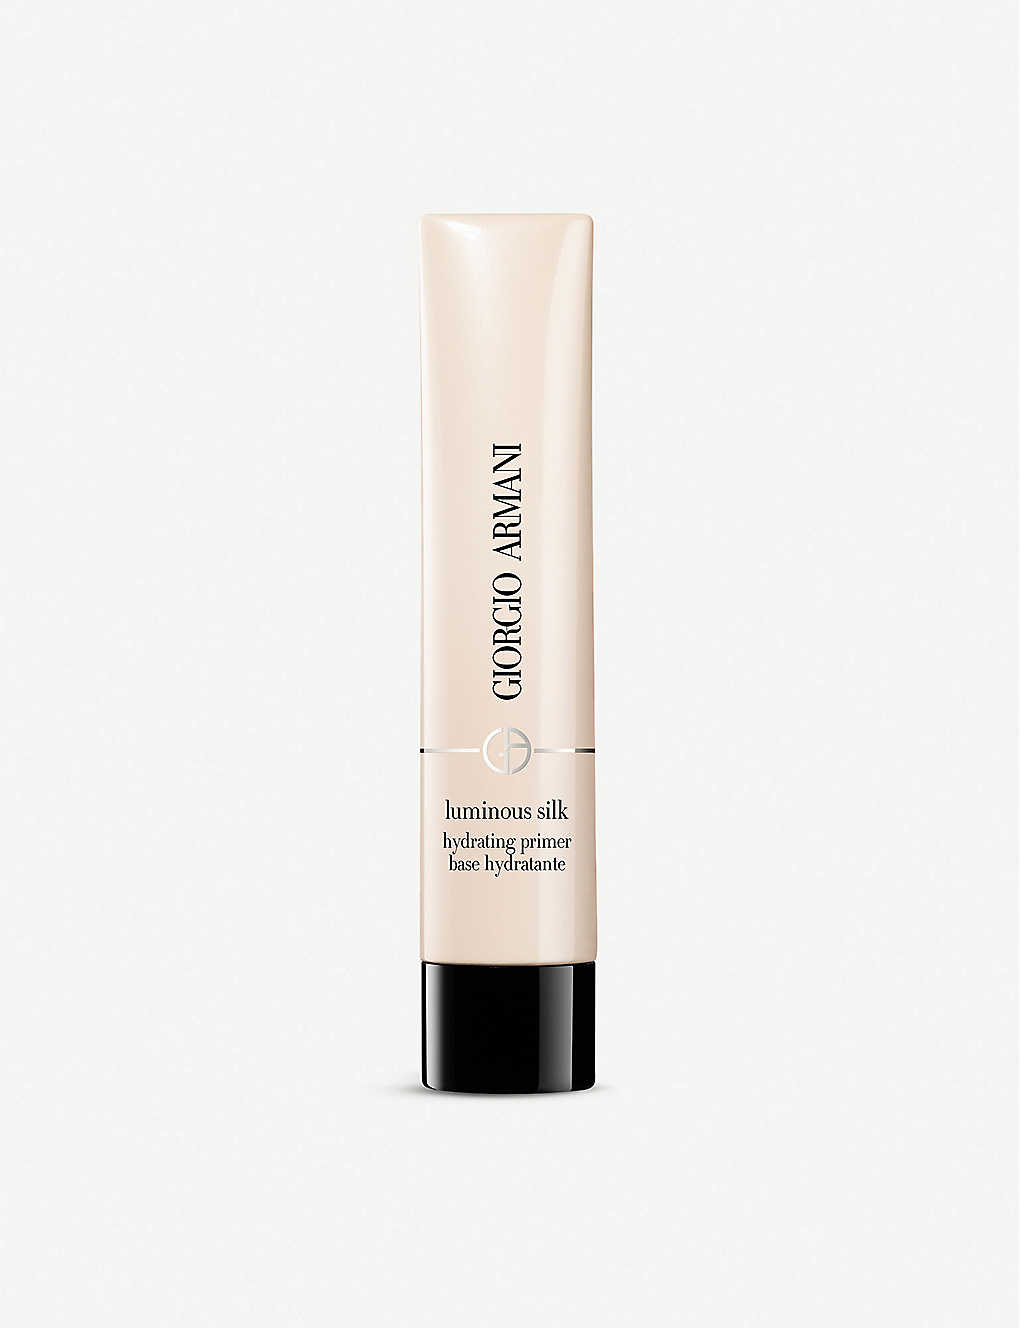 GIORGIO ARMANI: Luminous Silk Hydrating Primer 30ml